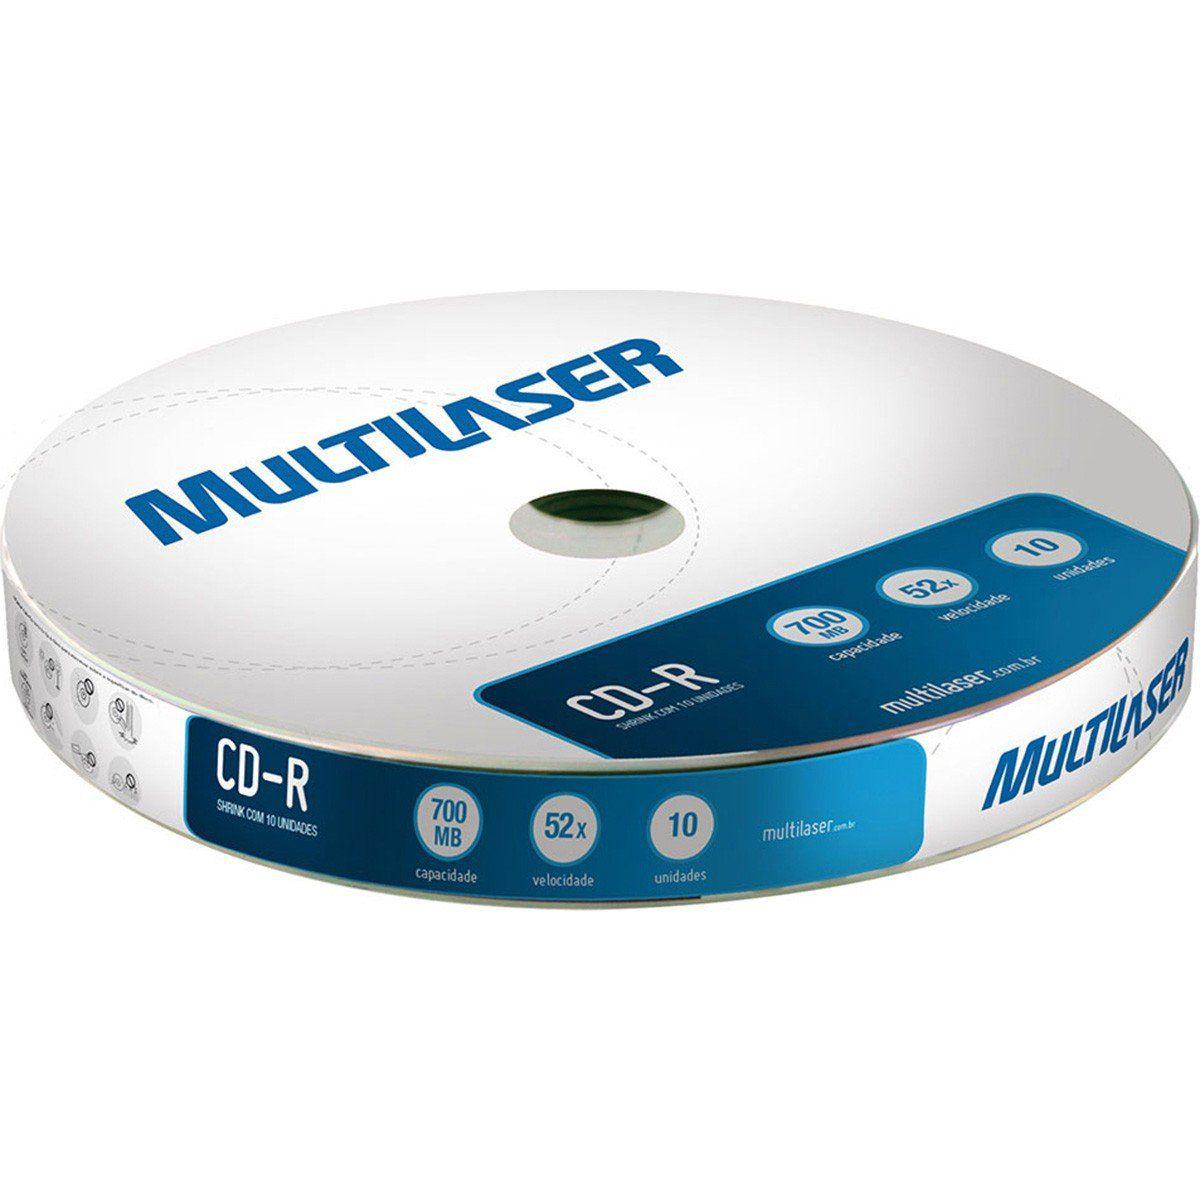 Multilaser CD027 700 MB 52x Shrink Mídia CD-R Pacote com 10 Peças